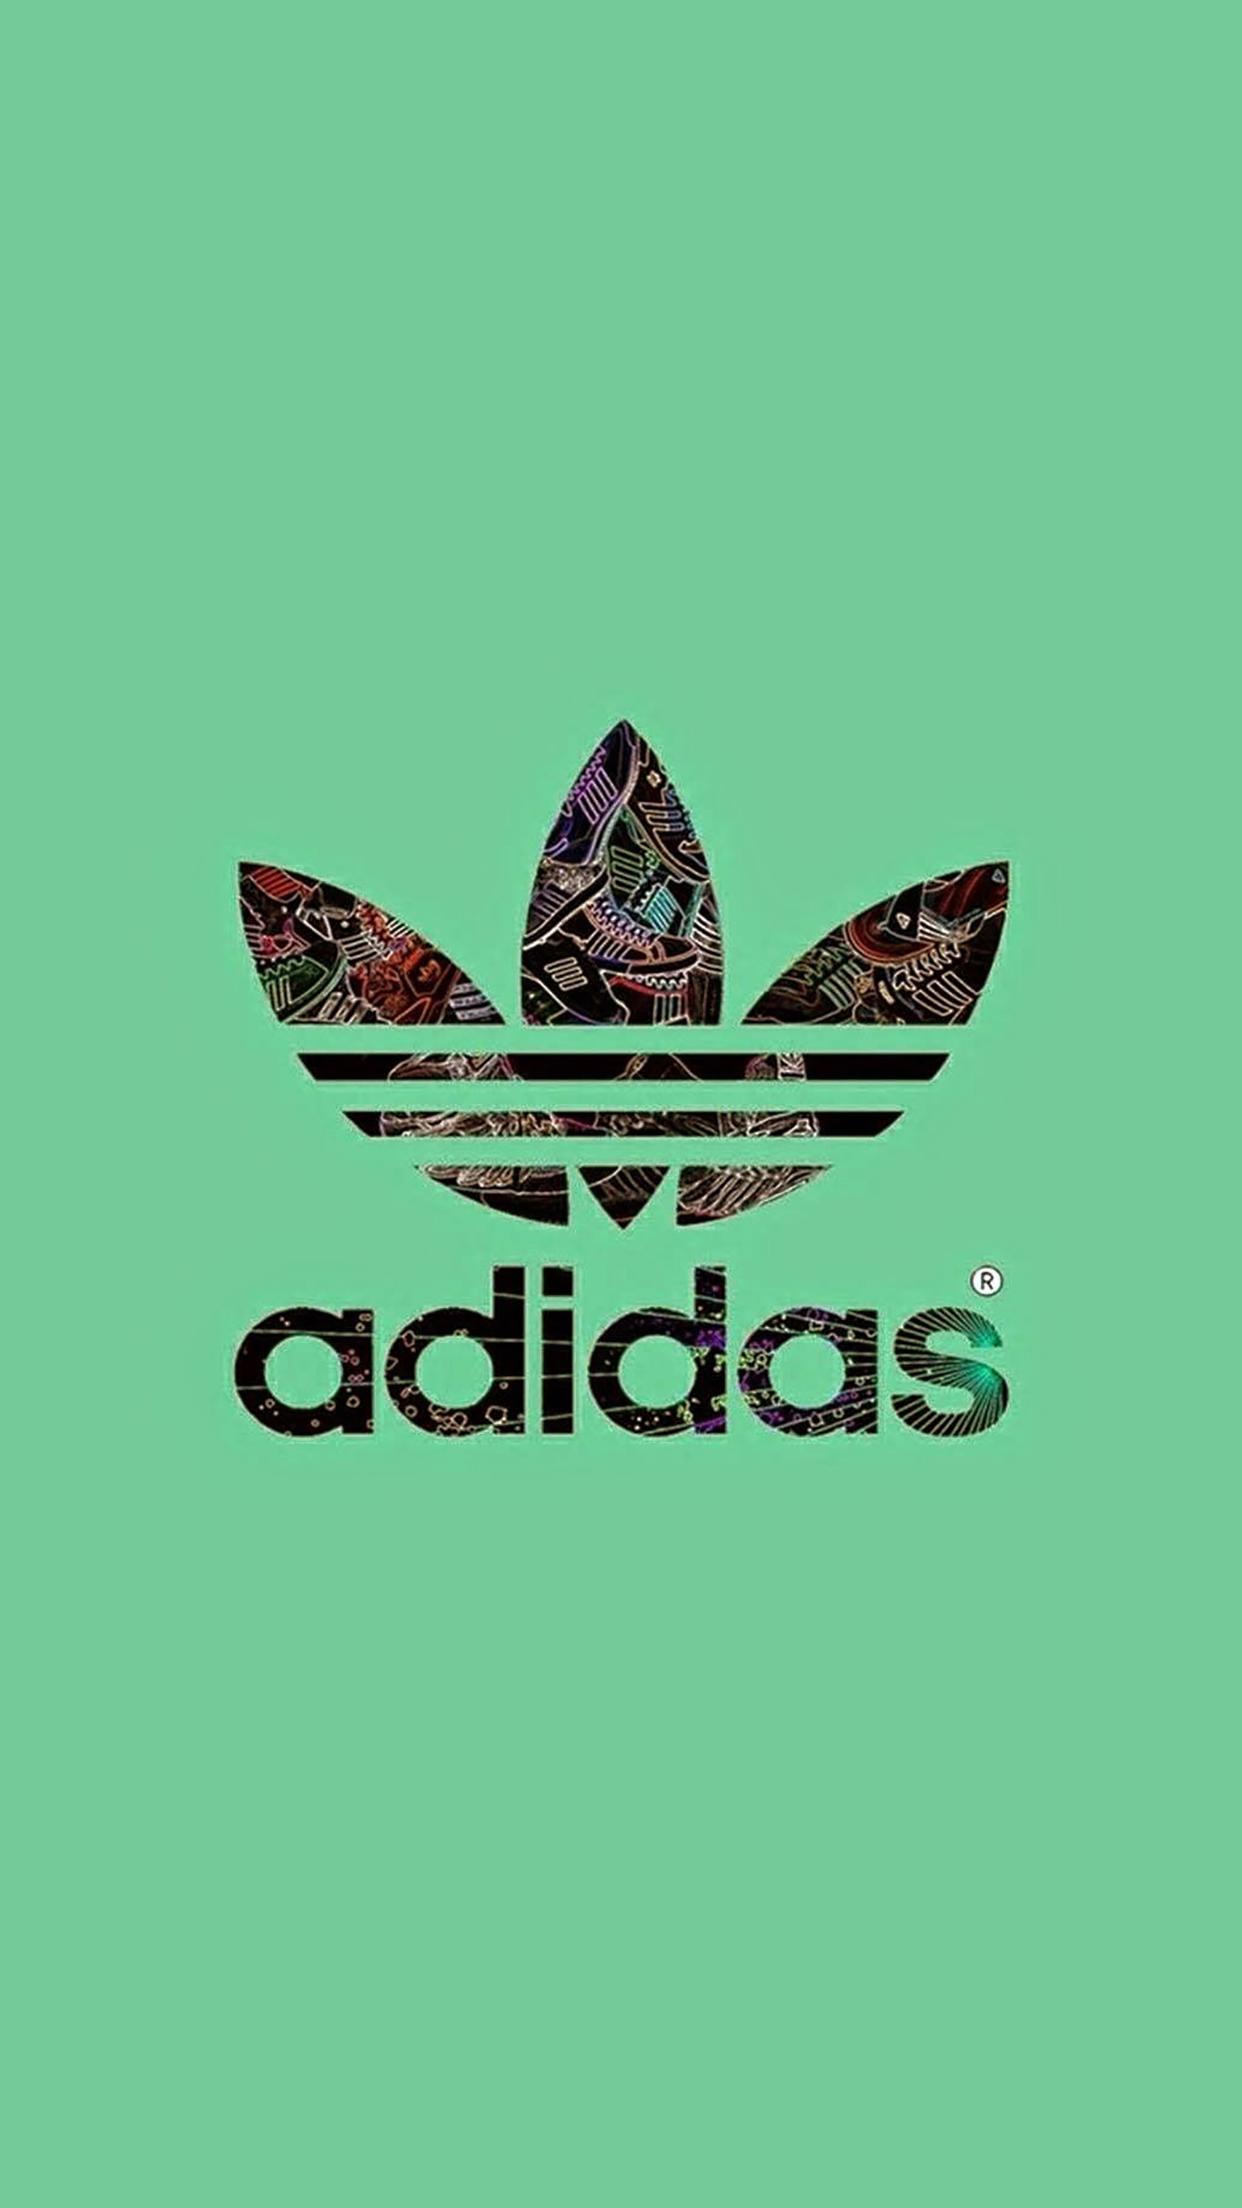 Wallpaper HD iPhone Adidas logo green background 1242x2208